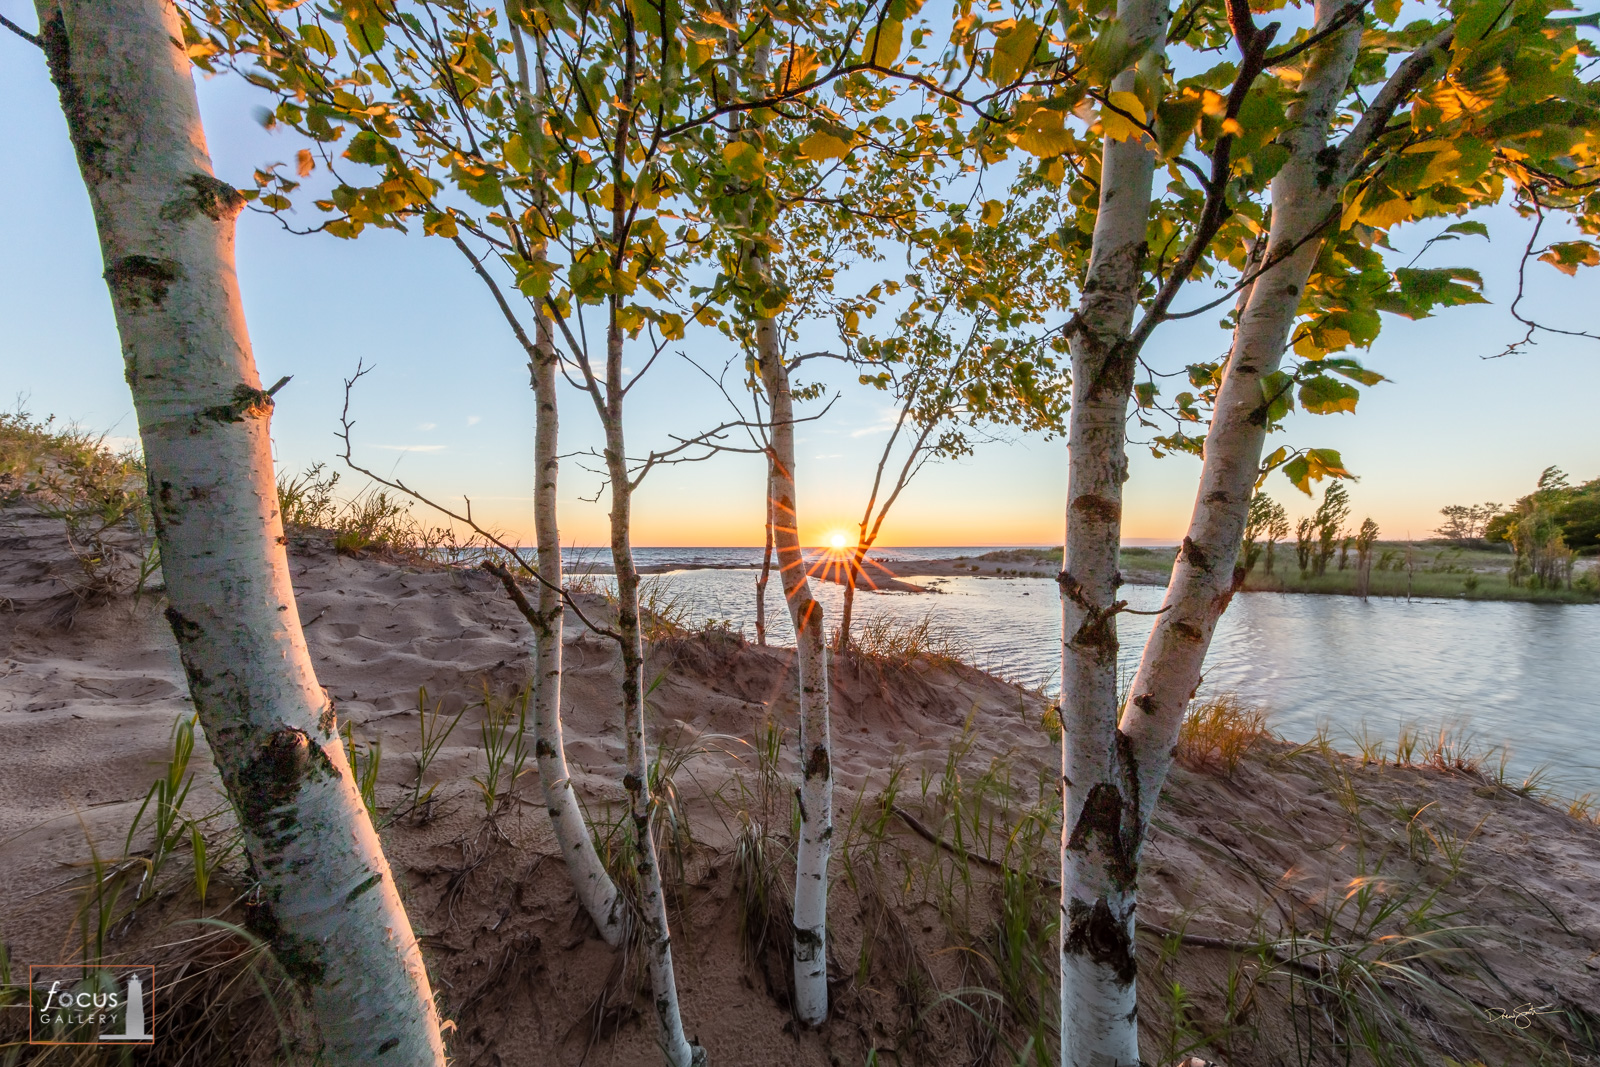 Sunset on a creek and Lake Michigan through birch trees.